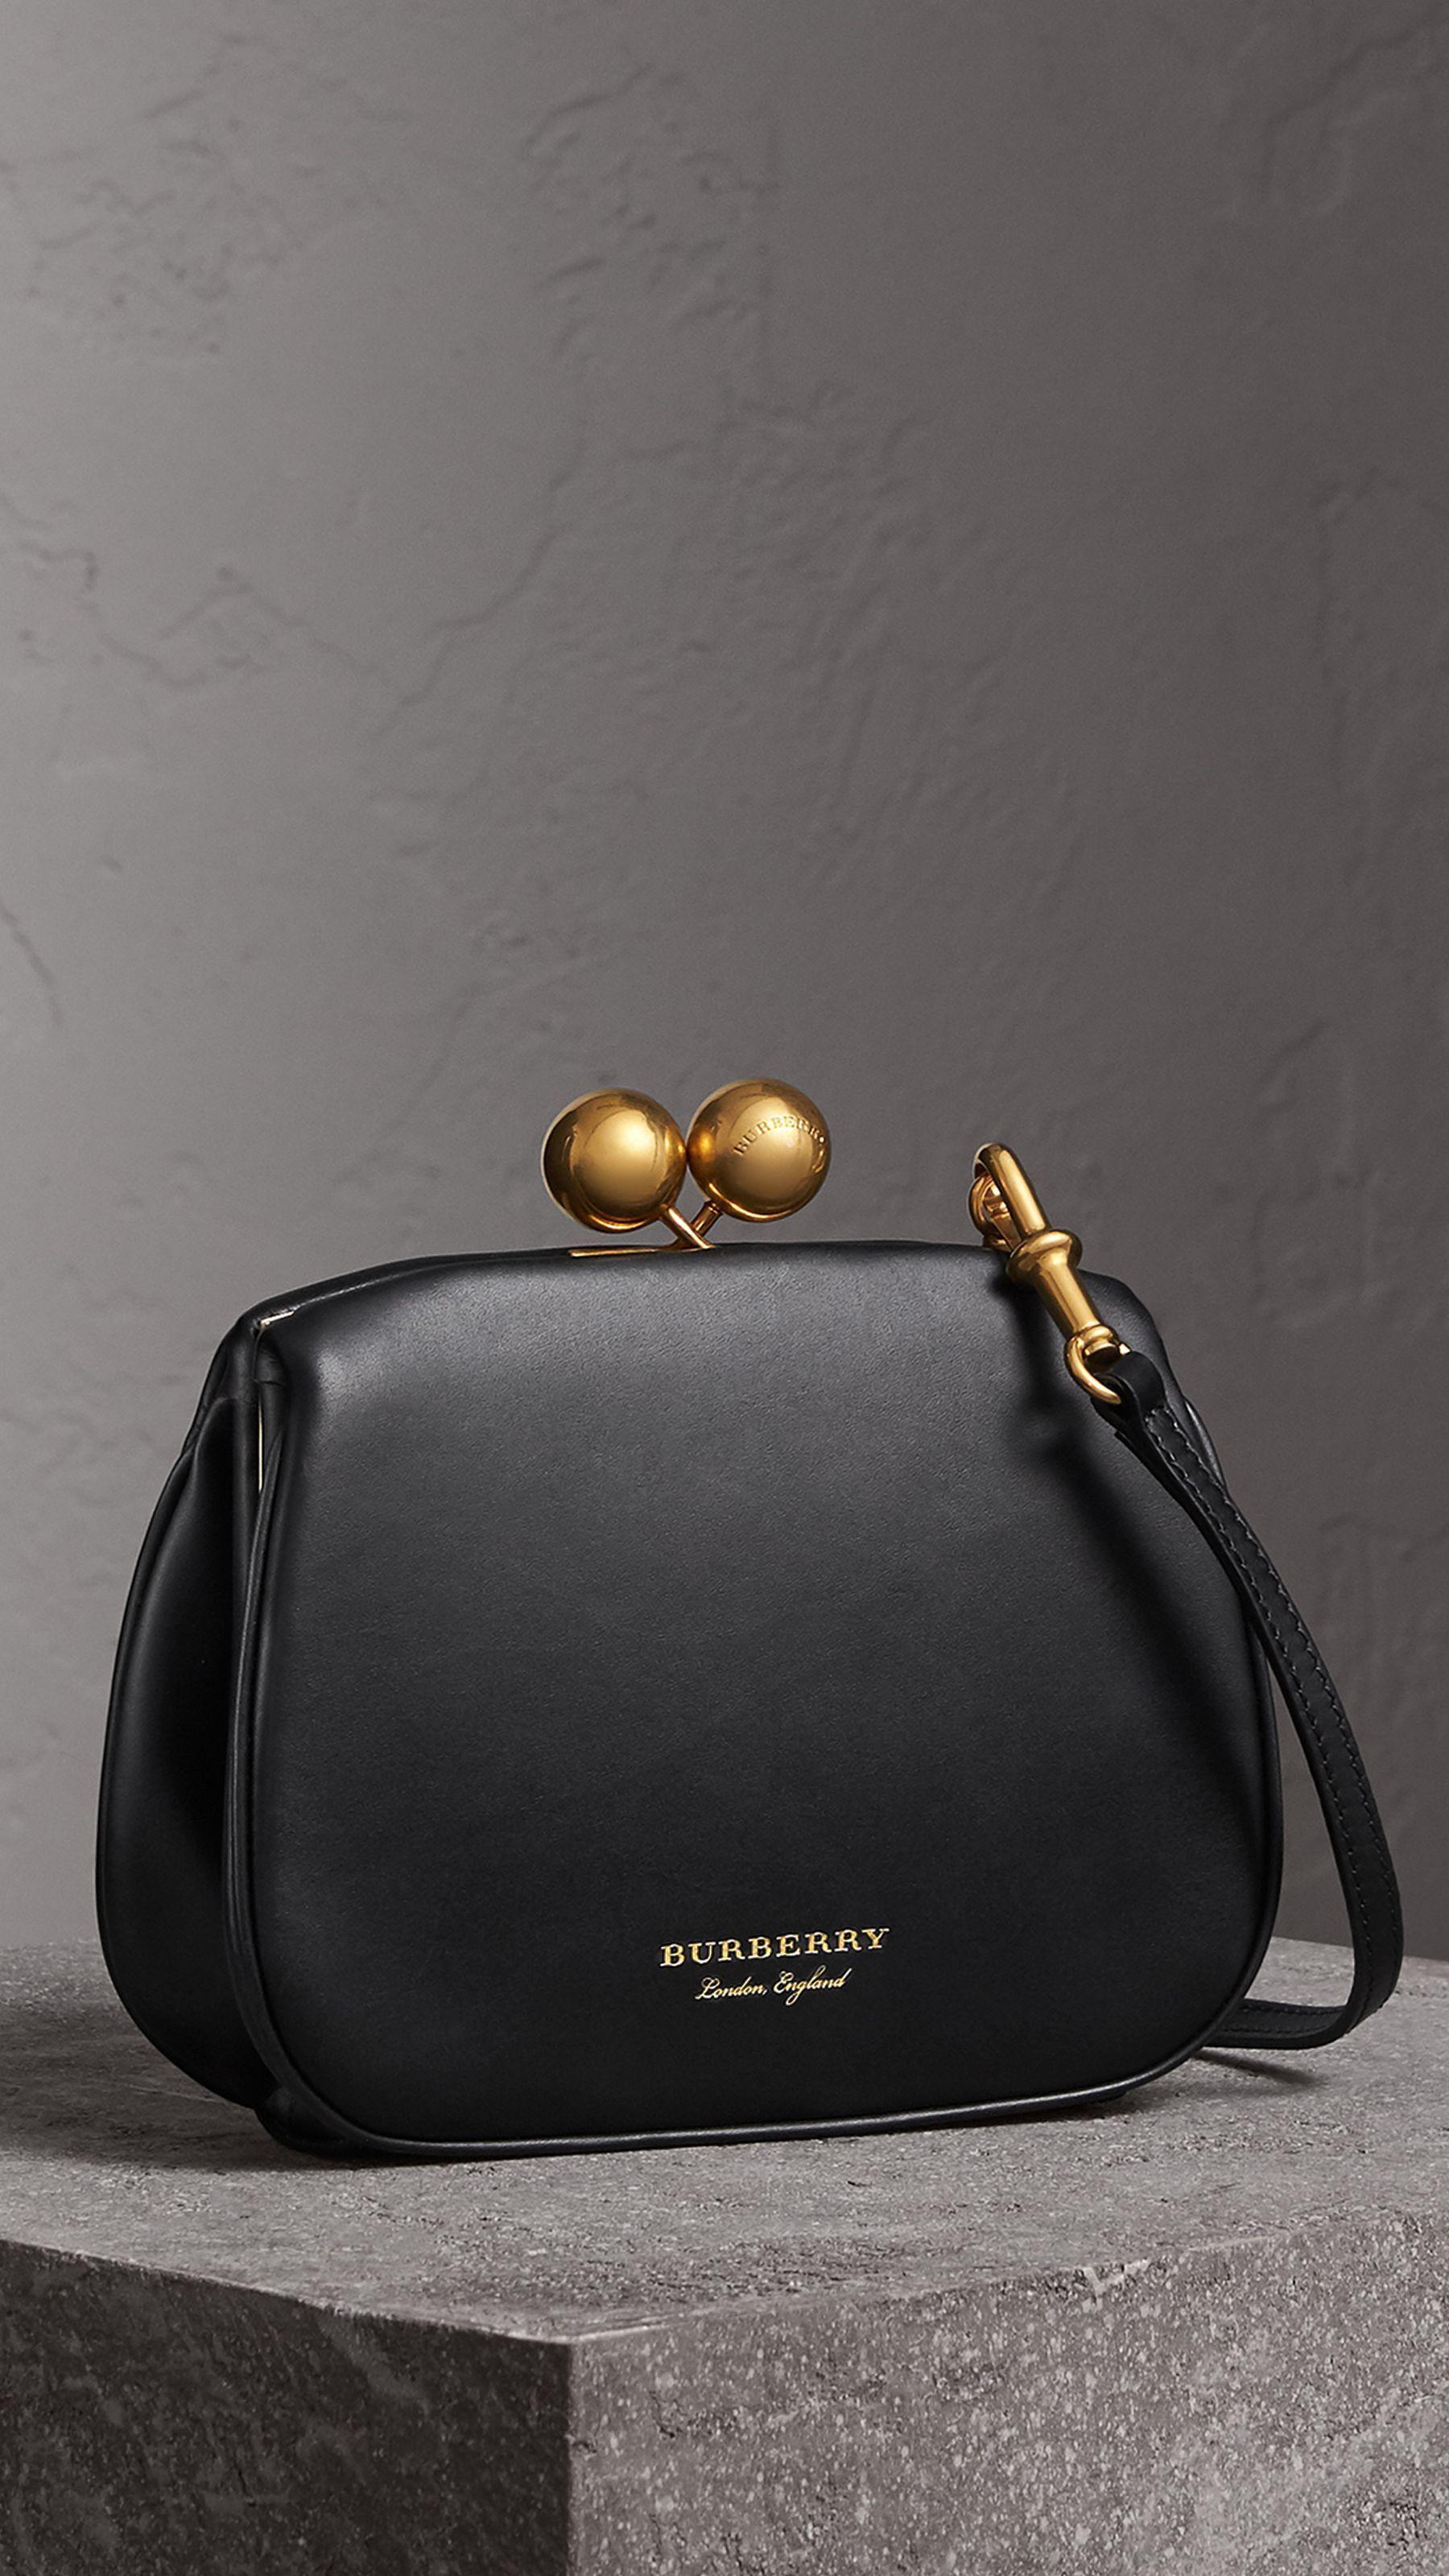 b5d15558d85 Small Leather Metal Frame Clutch Bag in Black - Women   Burberry United  States #clutchbags #blackclutchbag